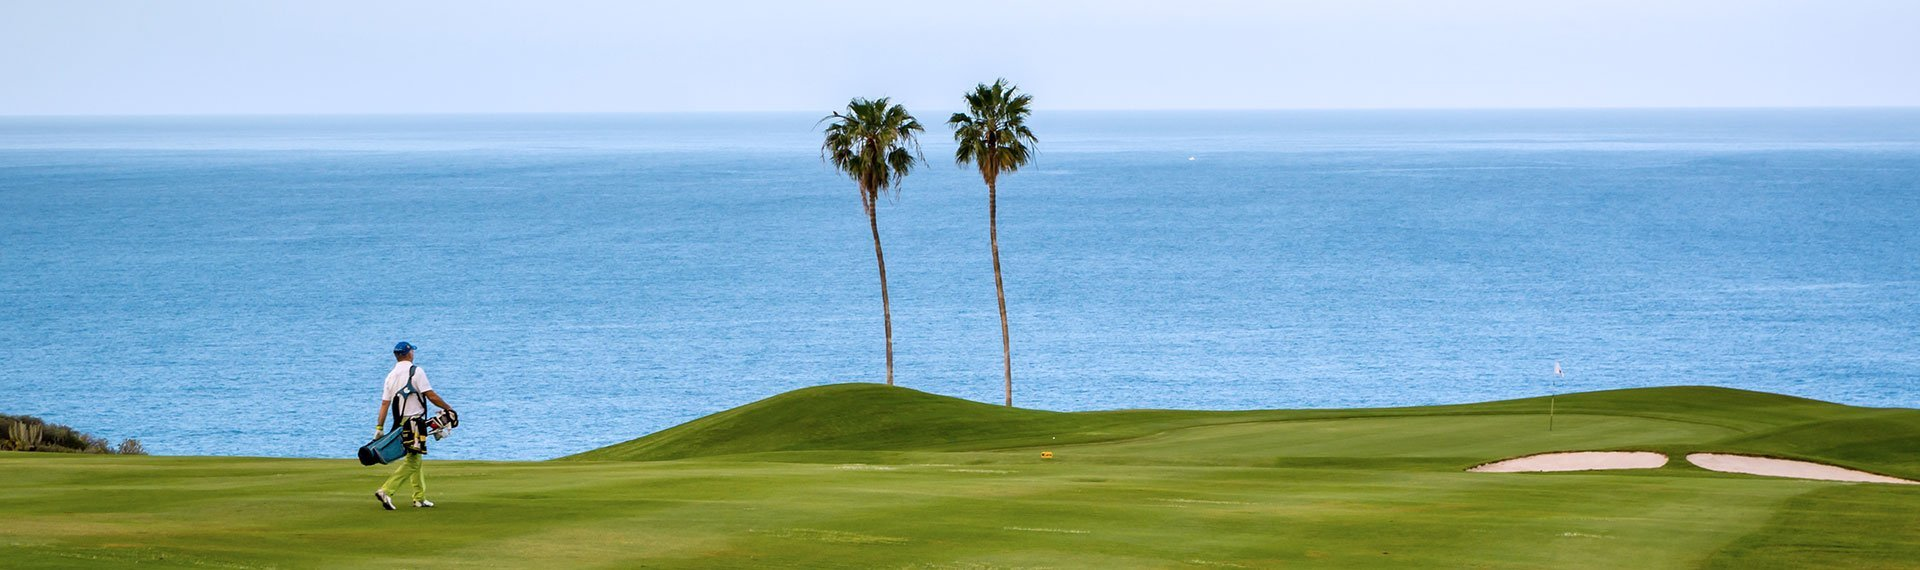 golf lovers nicho hero